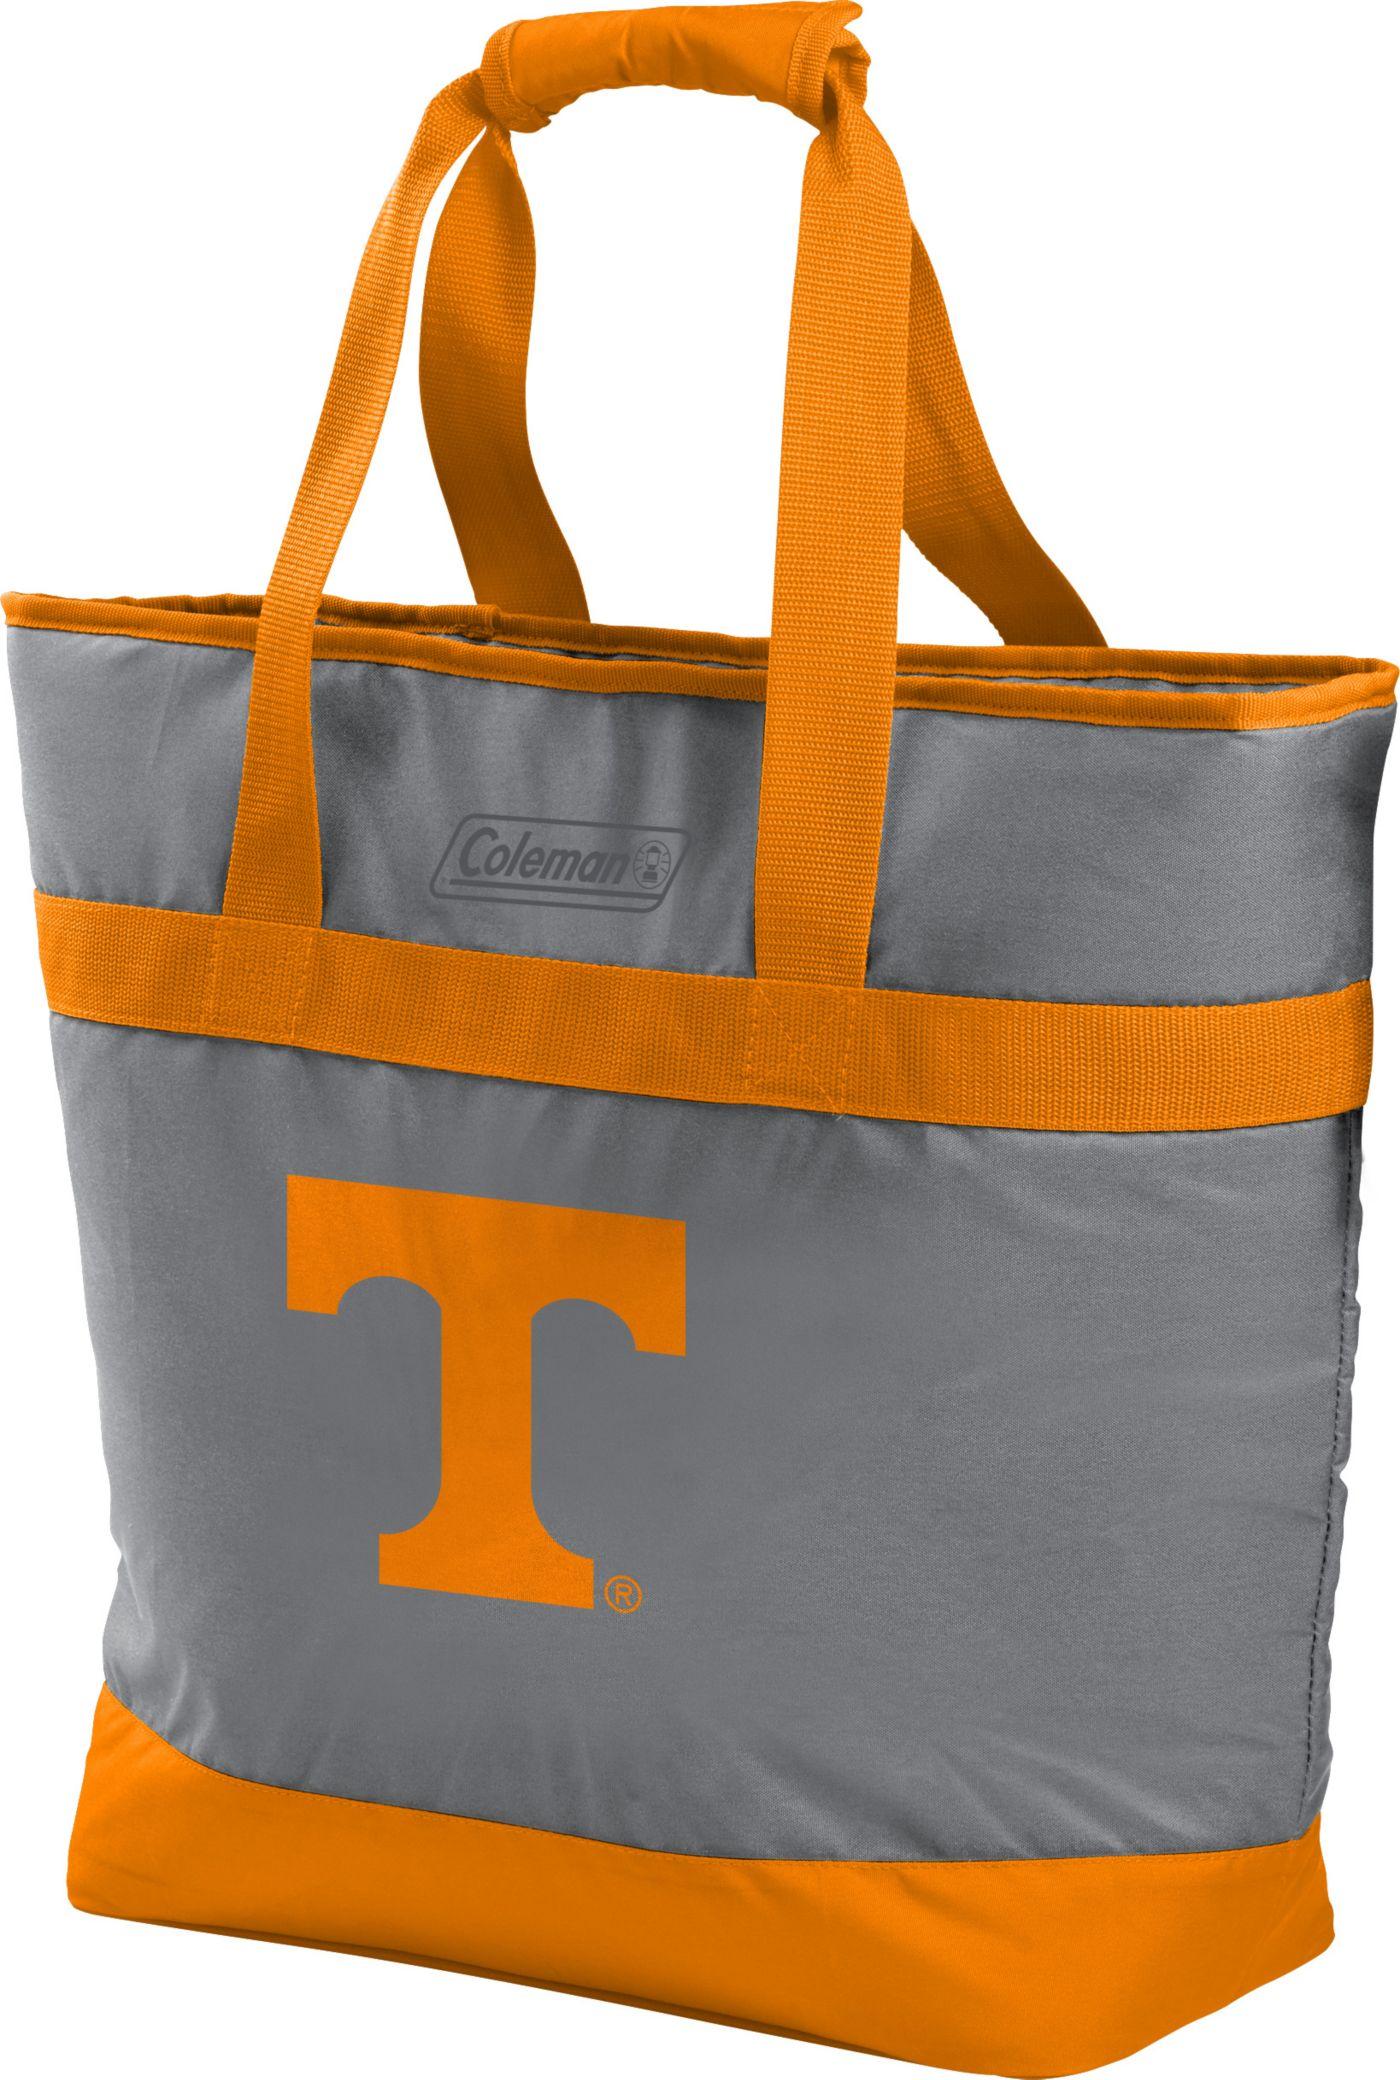 Rawlings Tennessee Volunteers 30-Can Tote Cooler